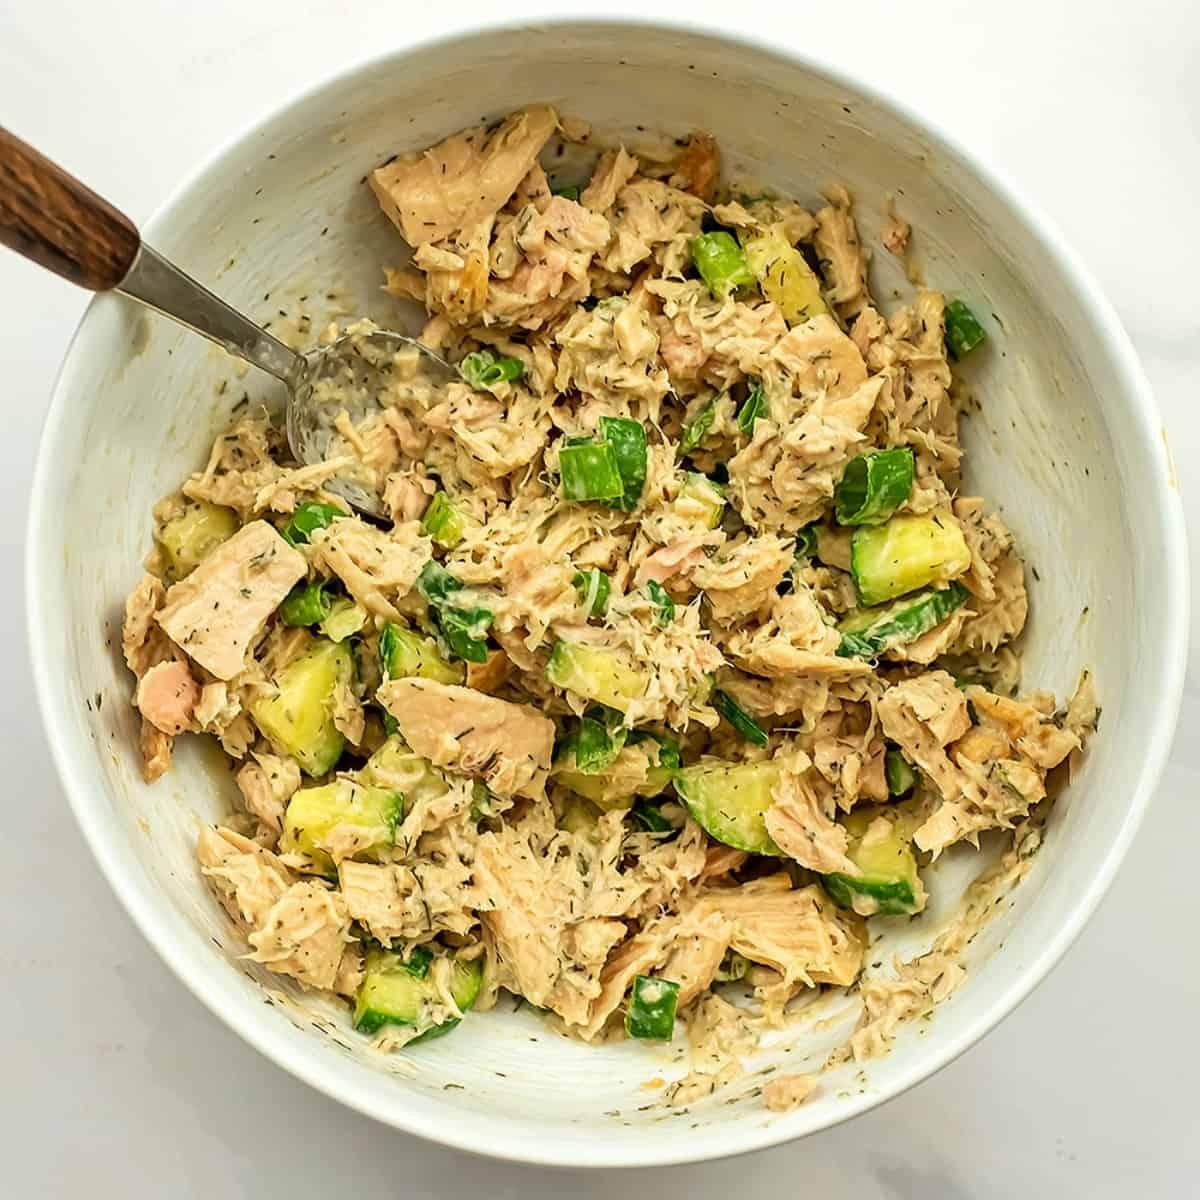 Low FODMAP tuna salad after stirring.